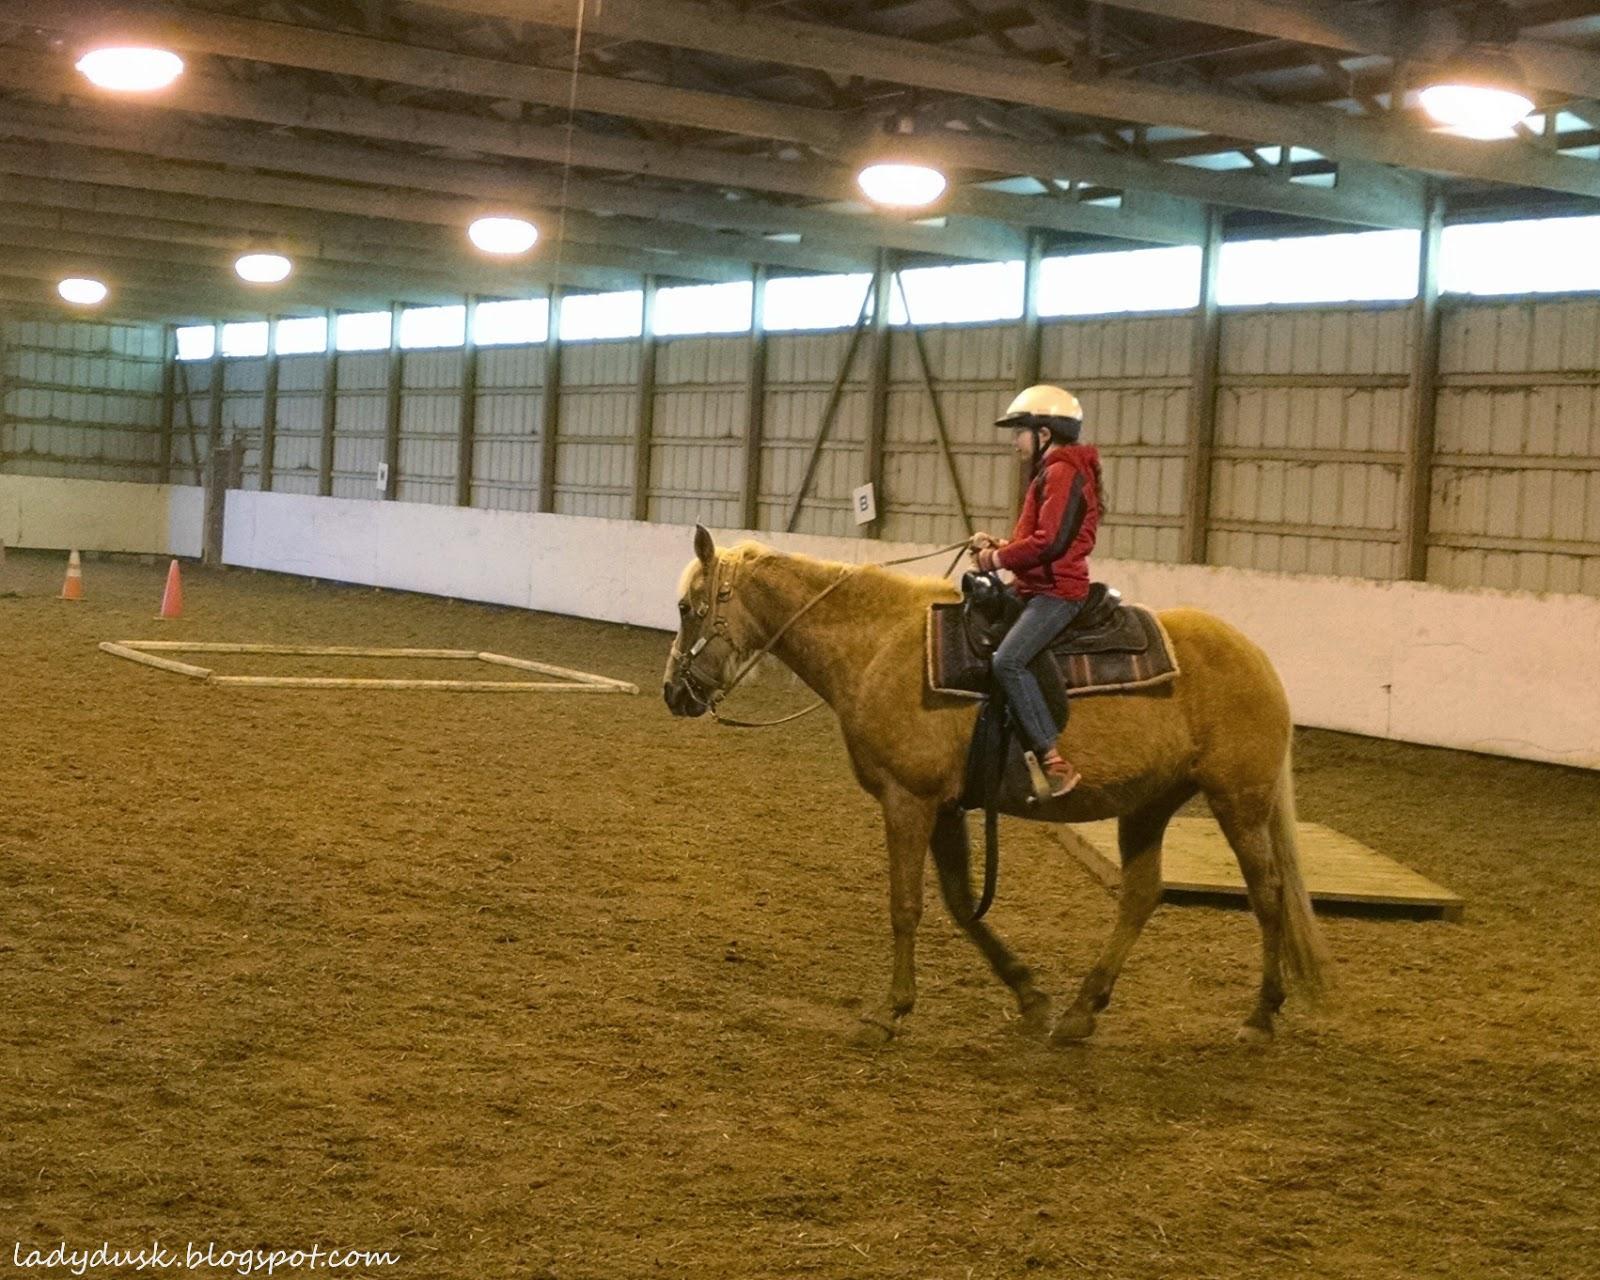 Wordless Wednesday: First Time Horseback Riding